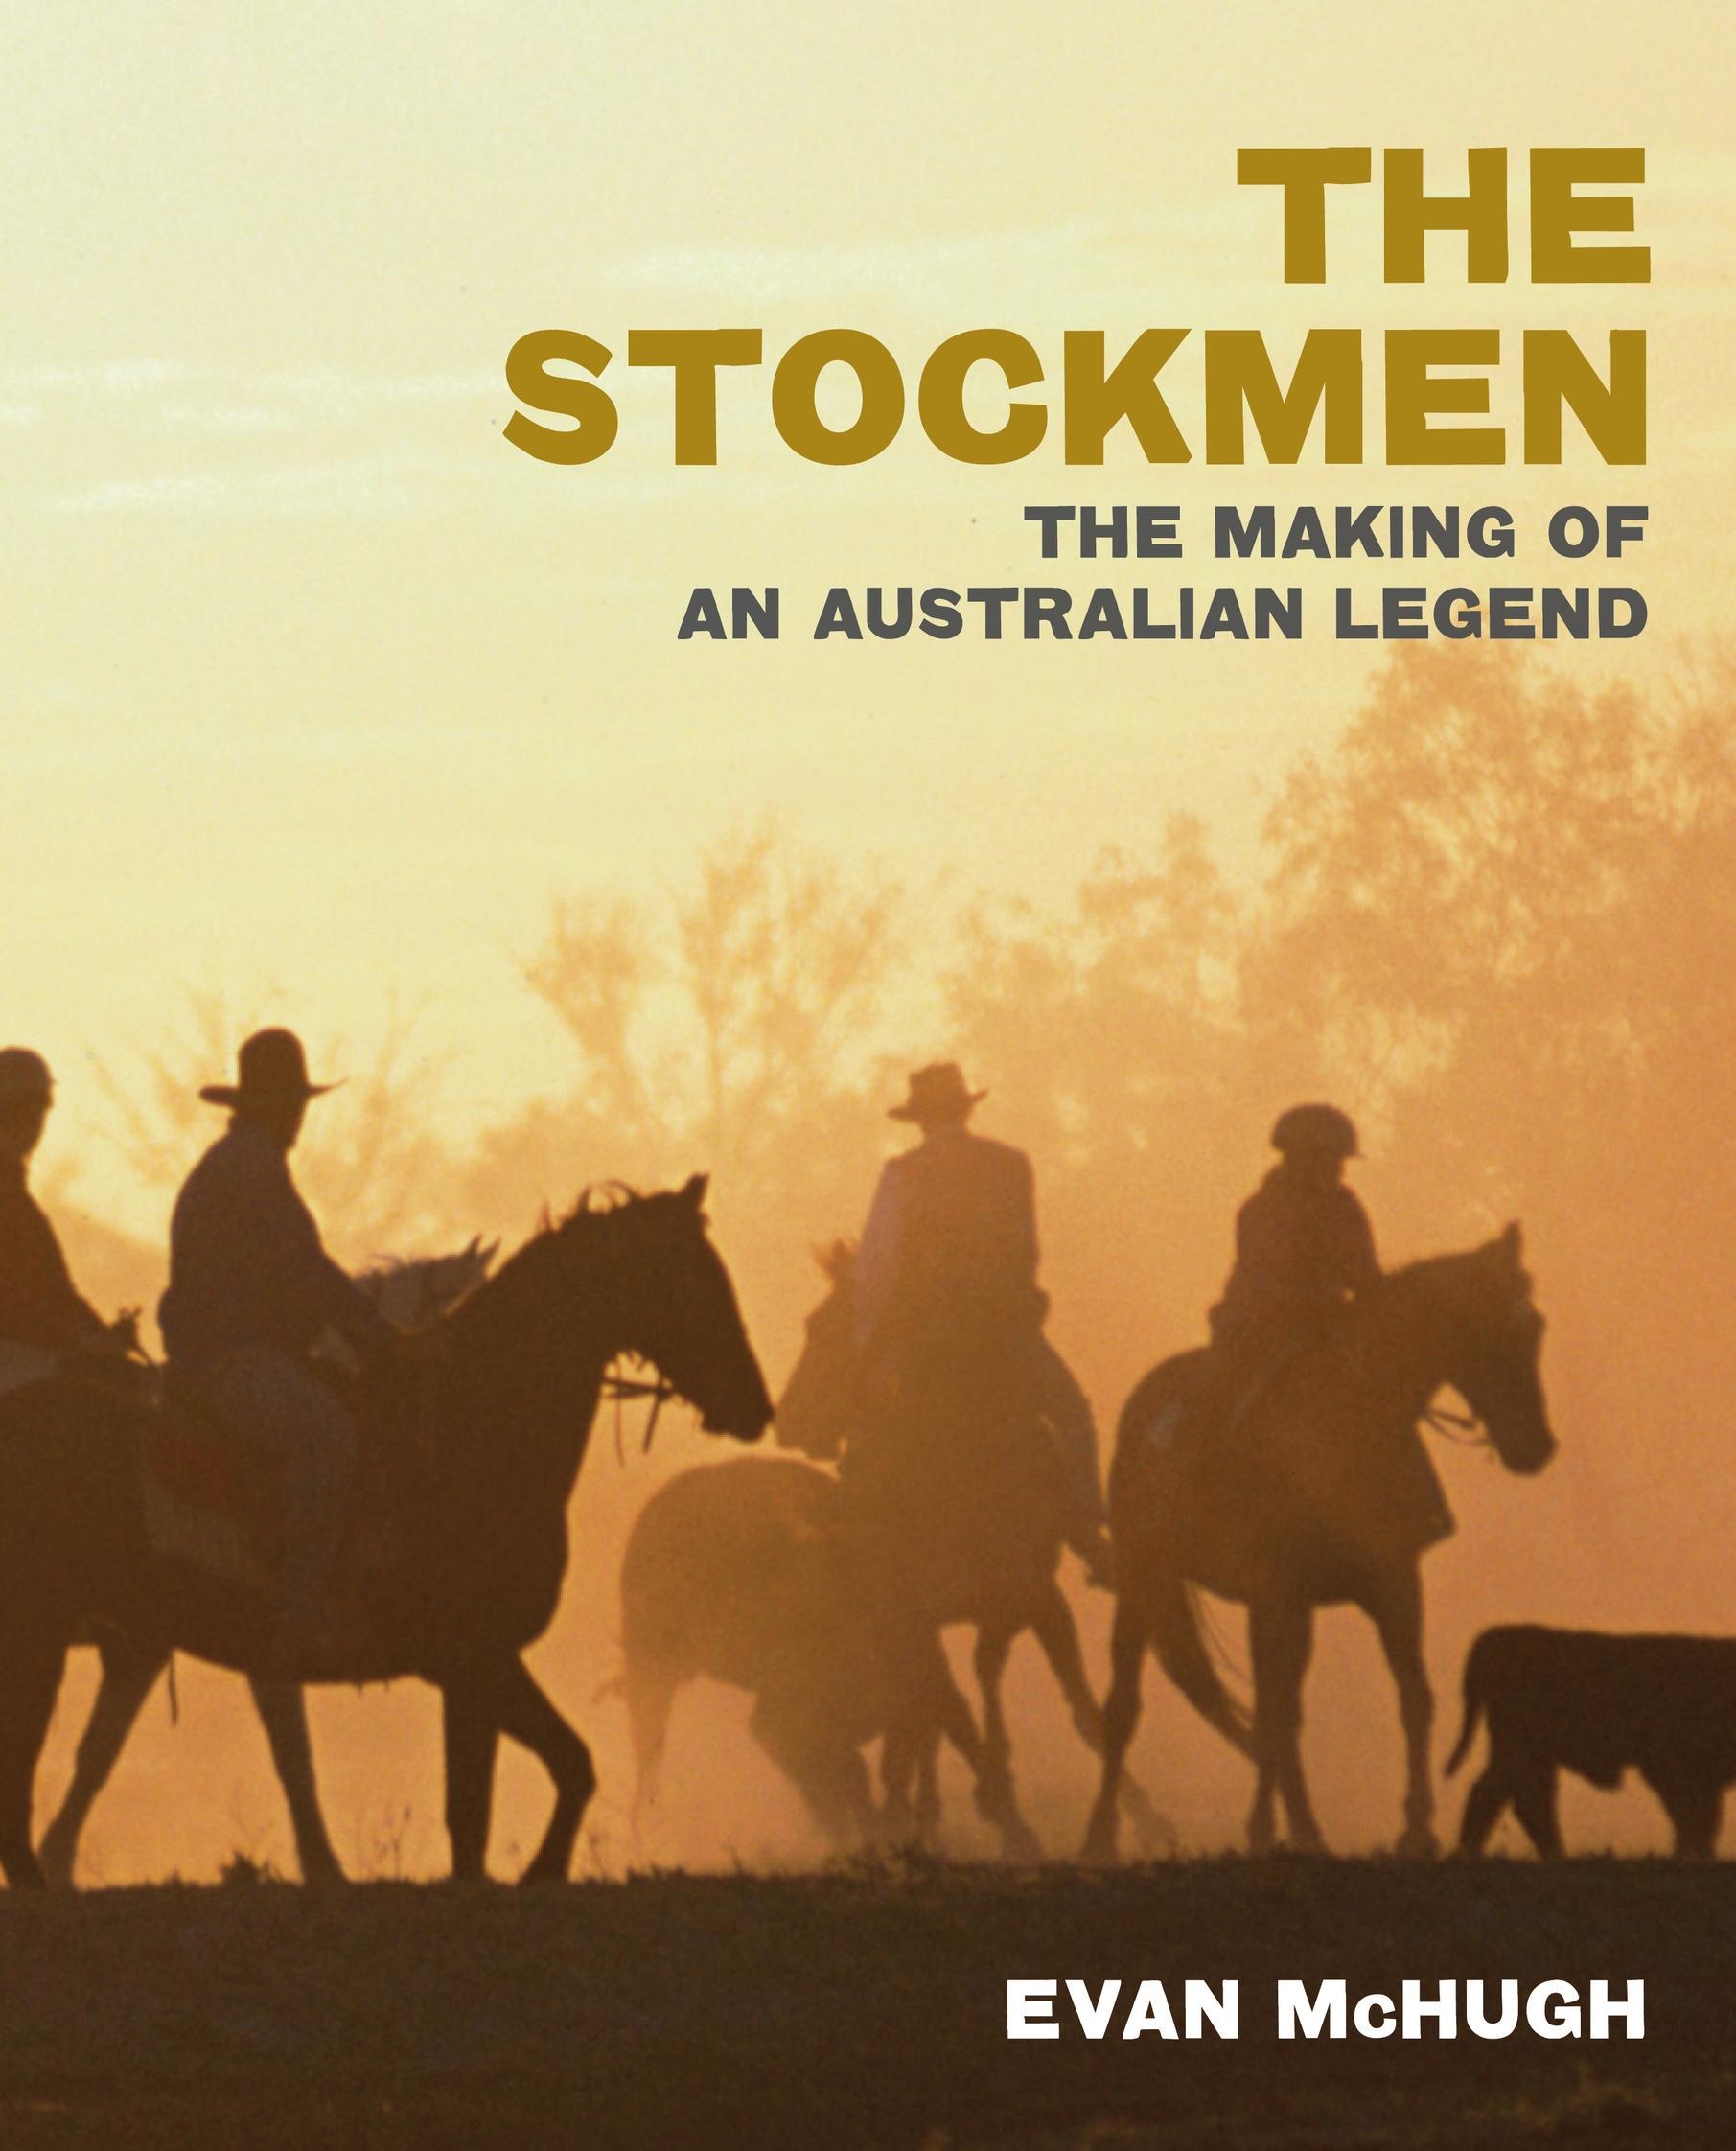 The Stockmen; The Making of an Australian Legend